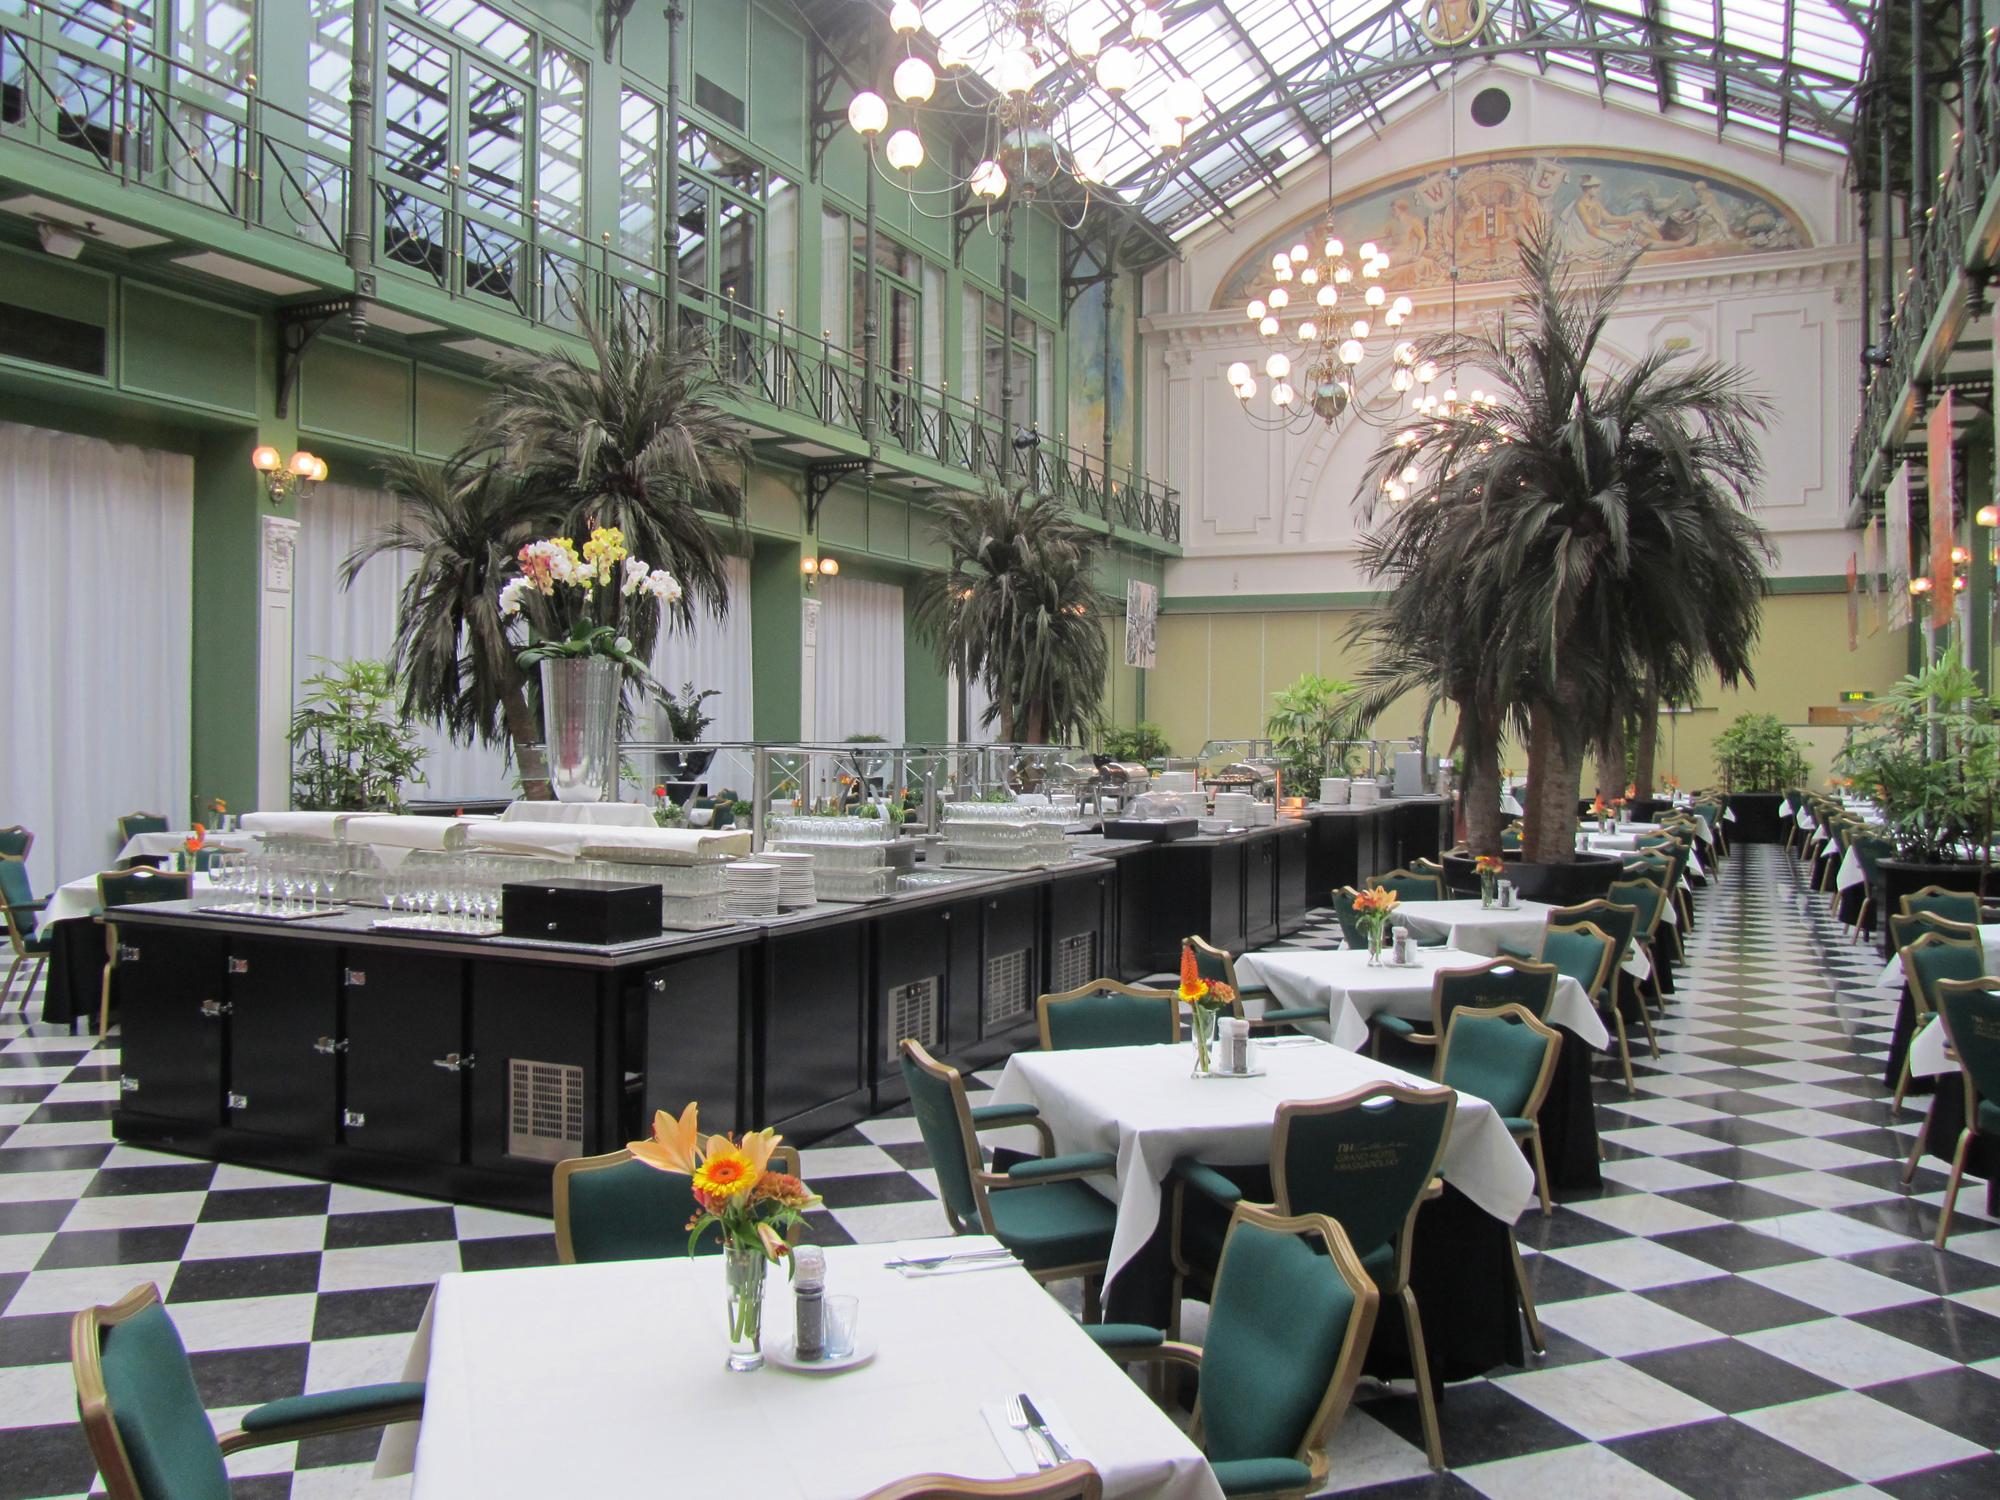 Krasnapolsky Hotel Amsterdam